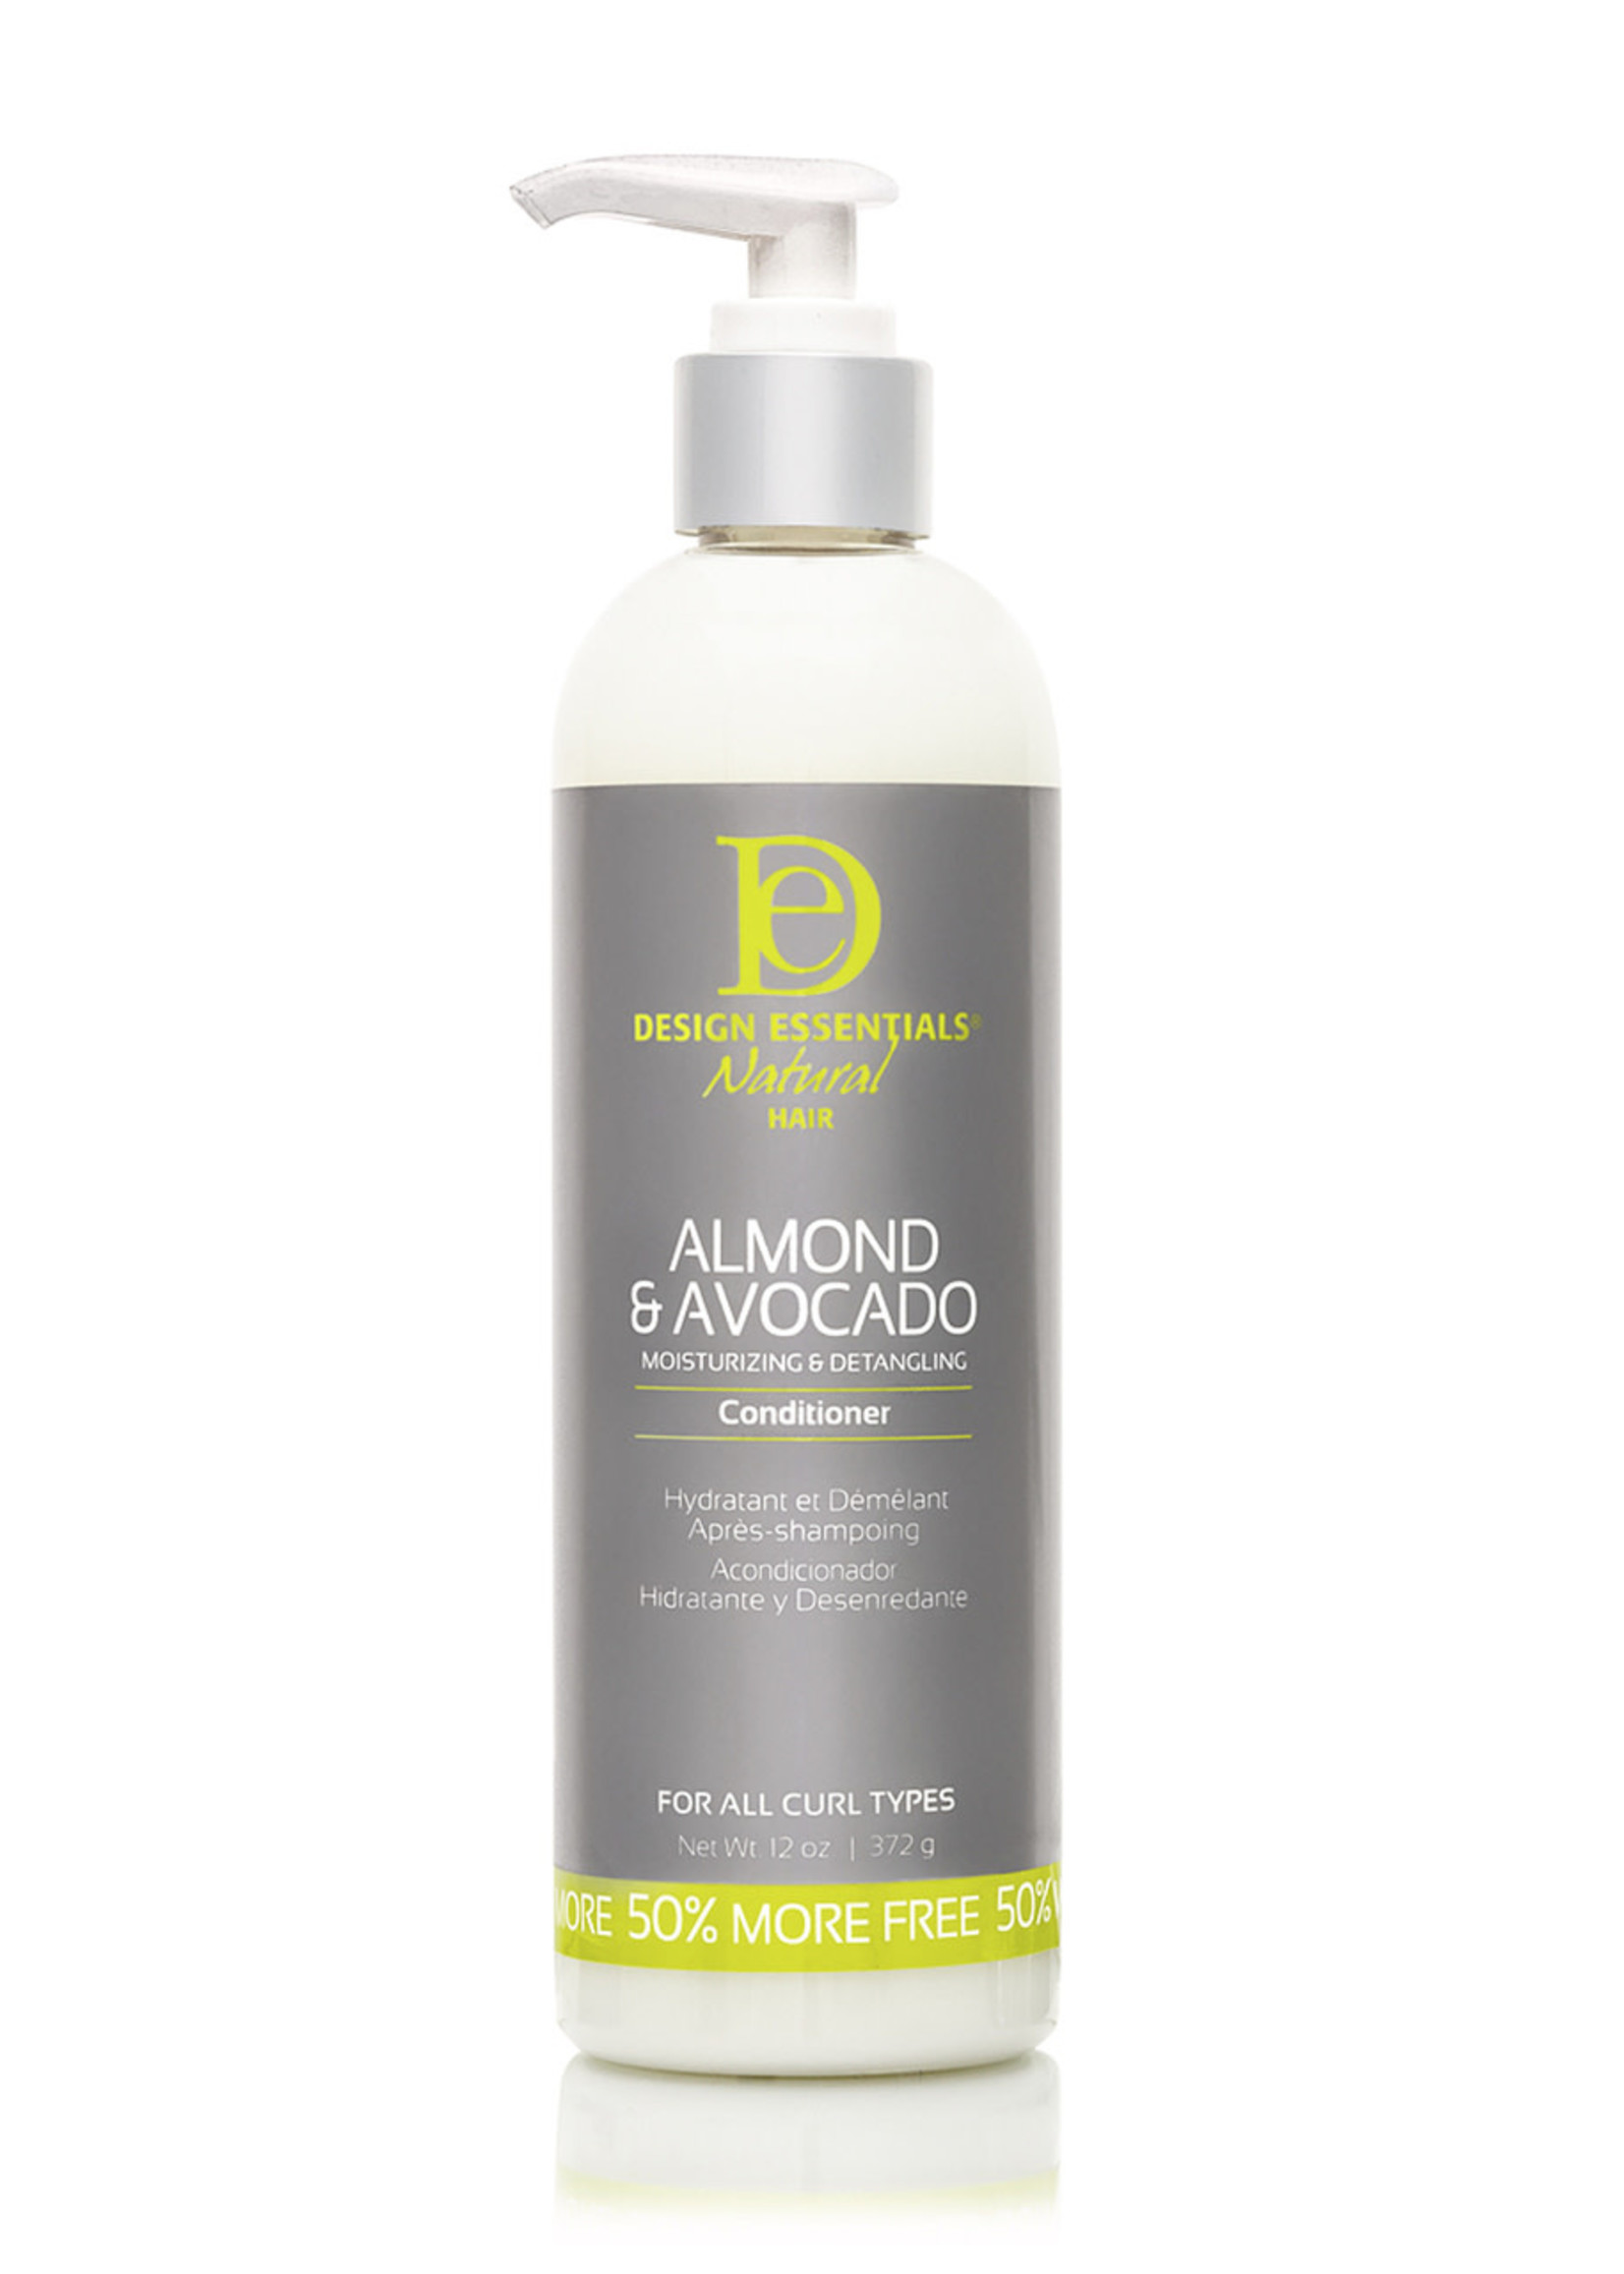 Design Essentials Almond & Avocado Conditioner